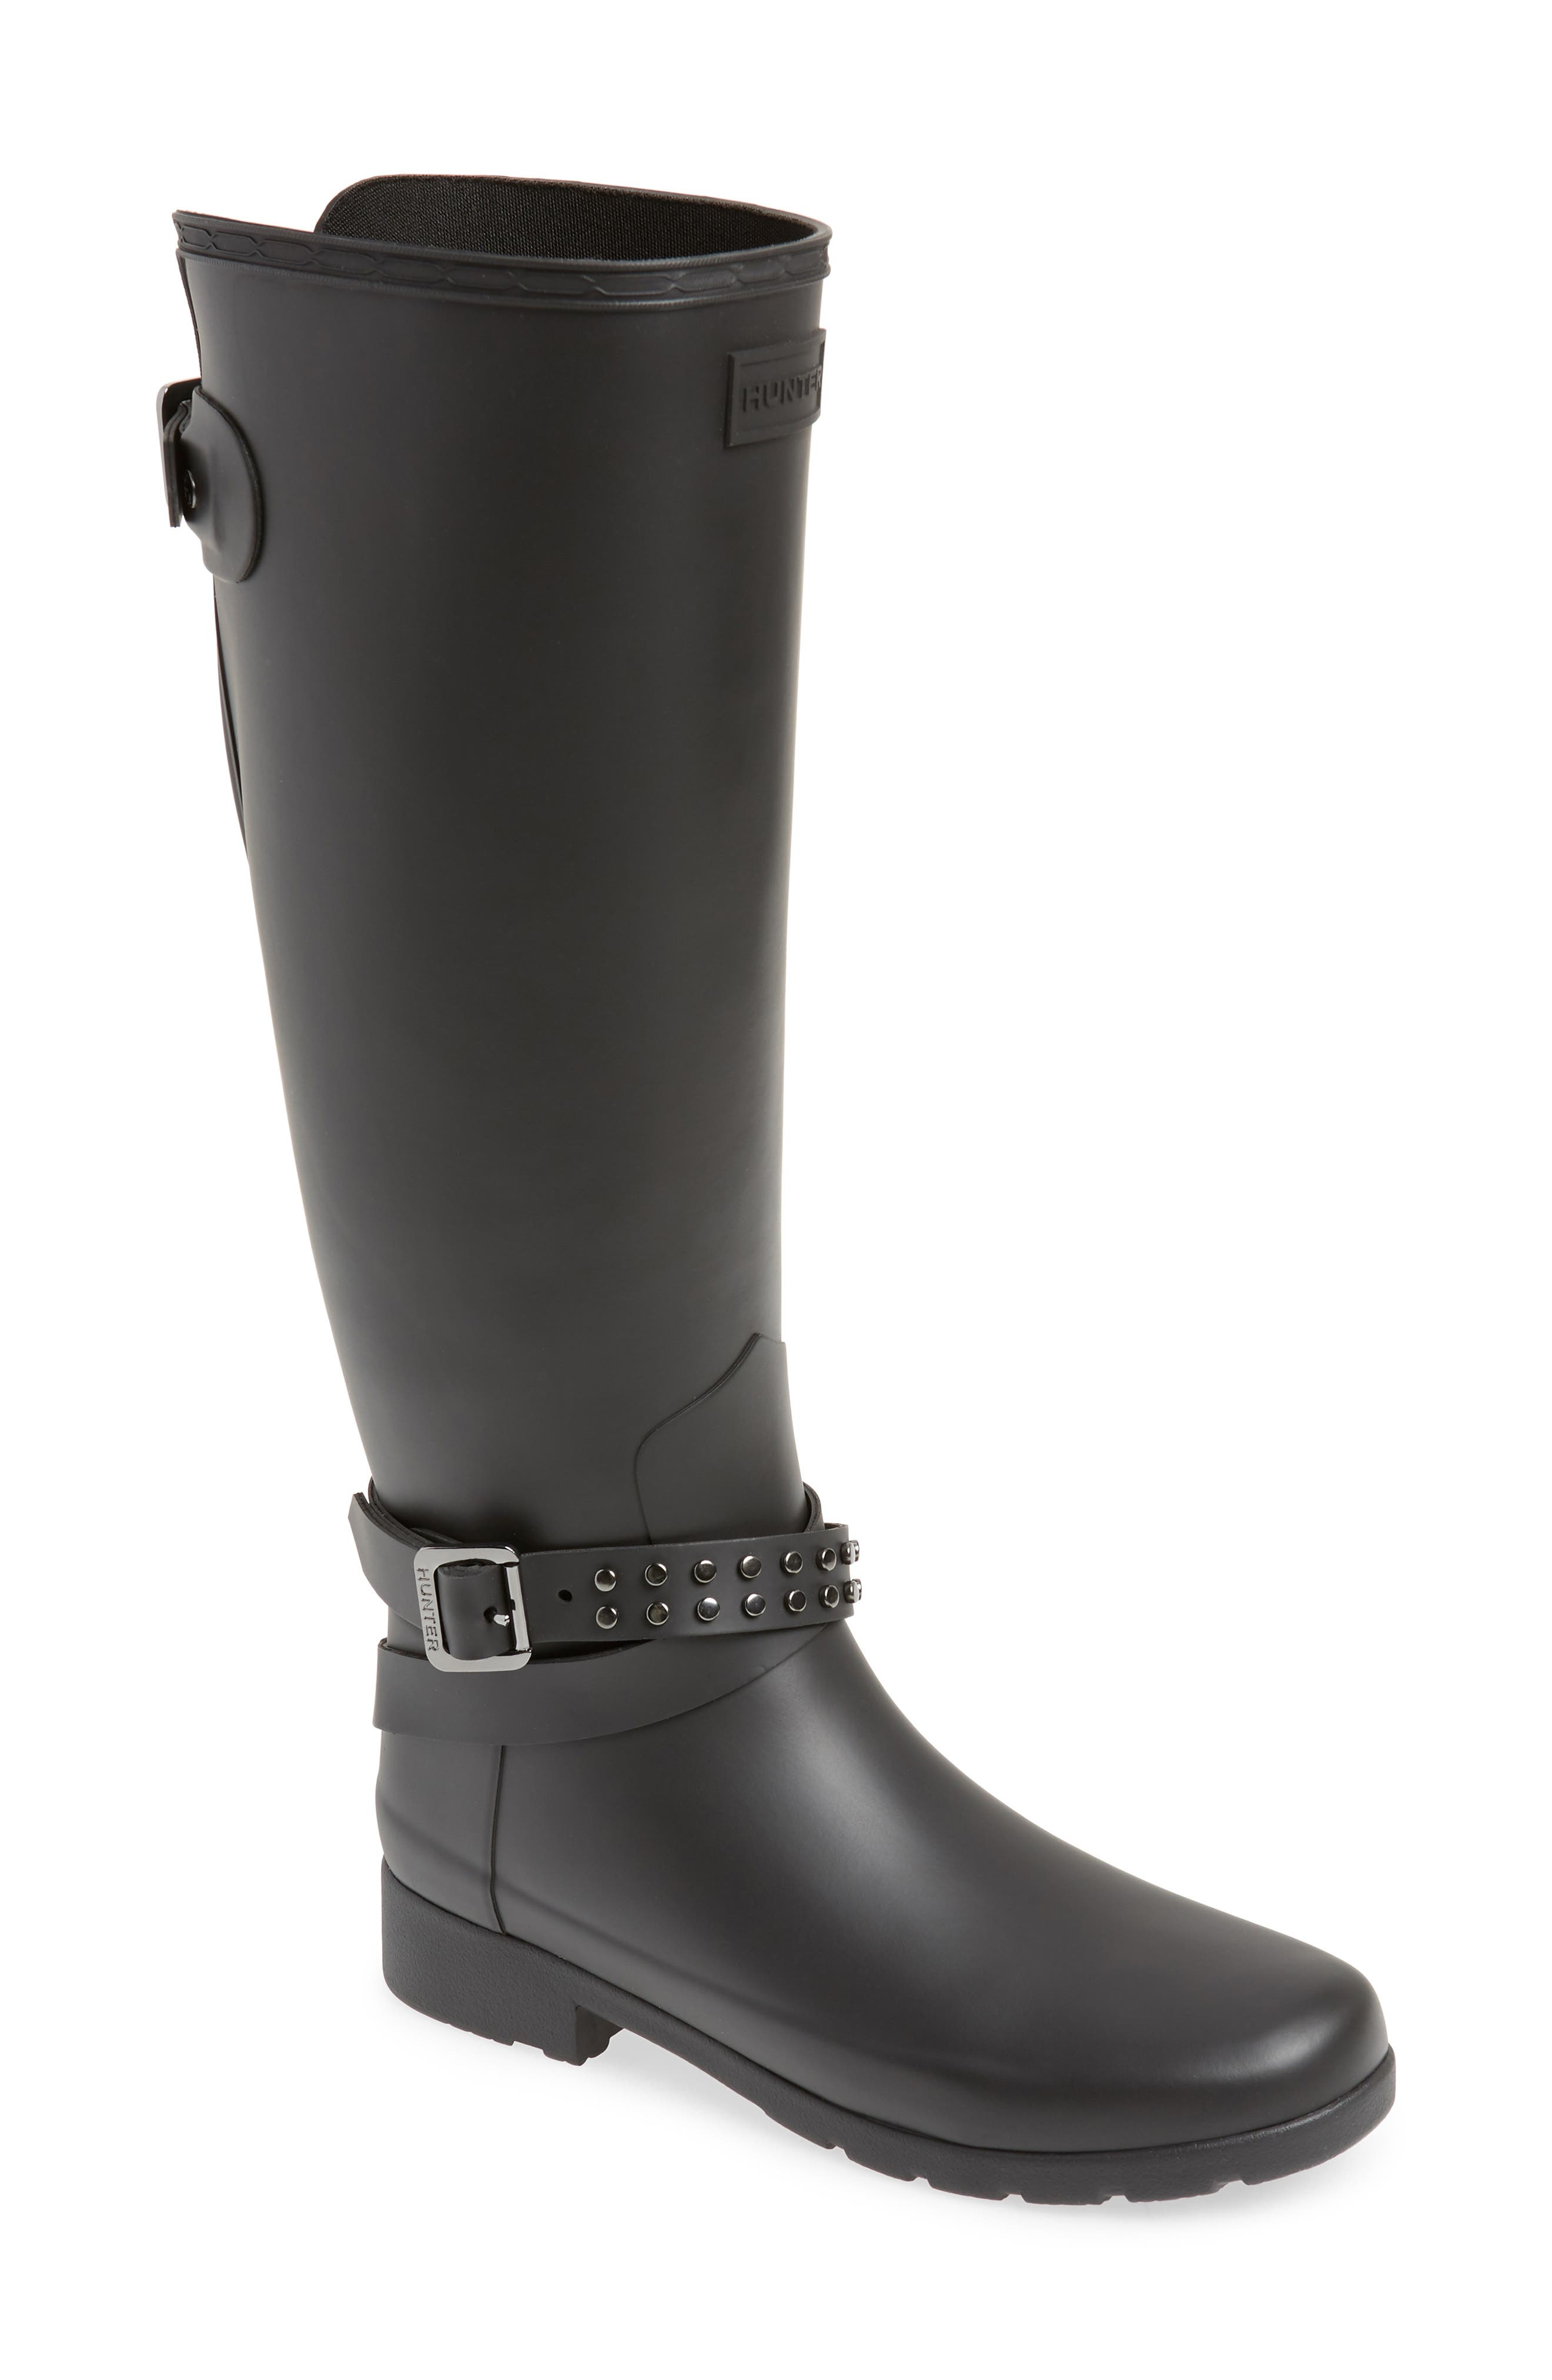 Hunter Refined Adjustable Back Knee High Waterproof Rain Boot, Black